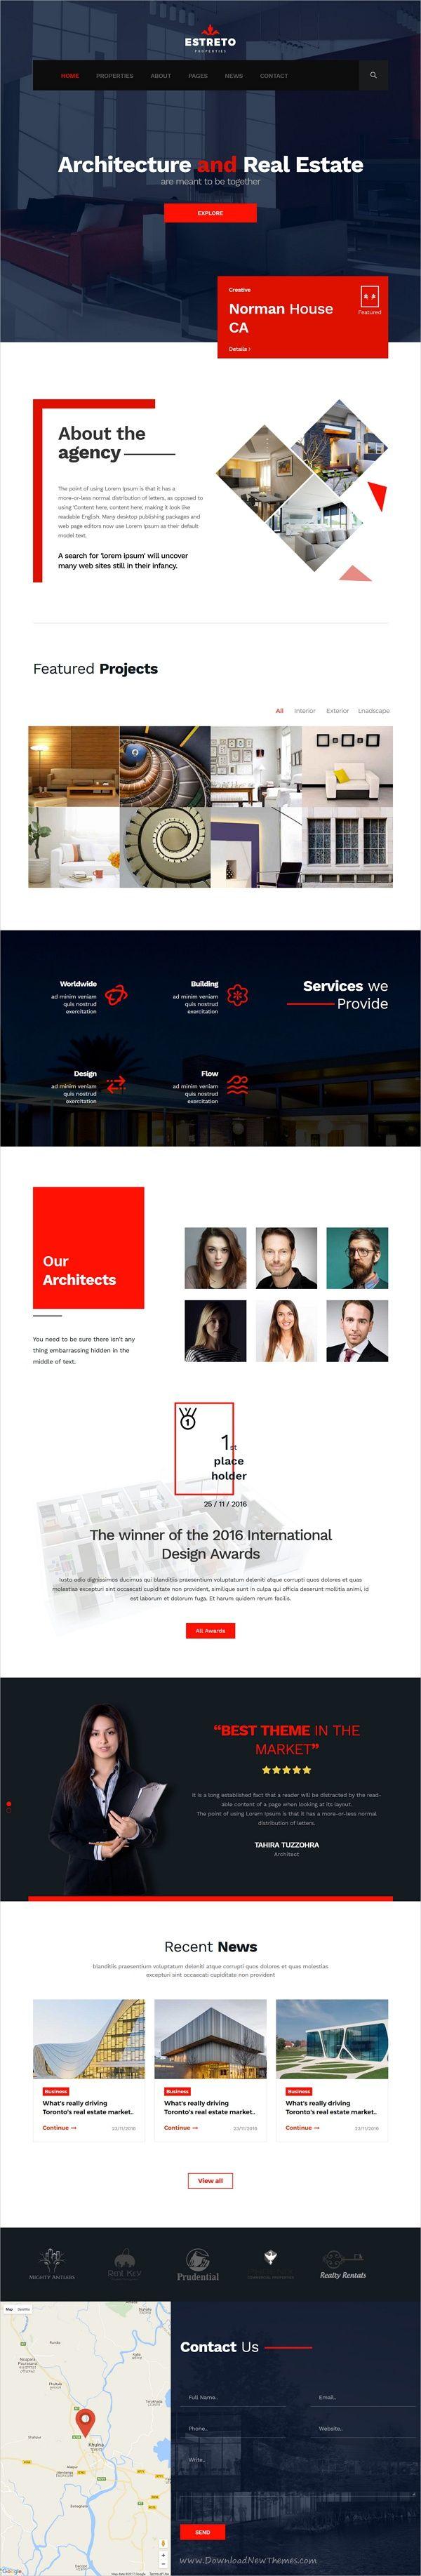 Estreto real estate property architecture construction html5 template webdesignconstruction companieshtml